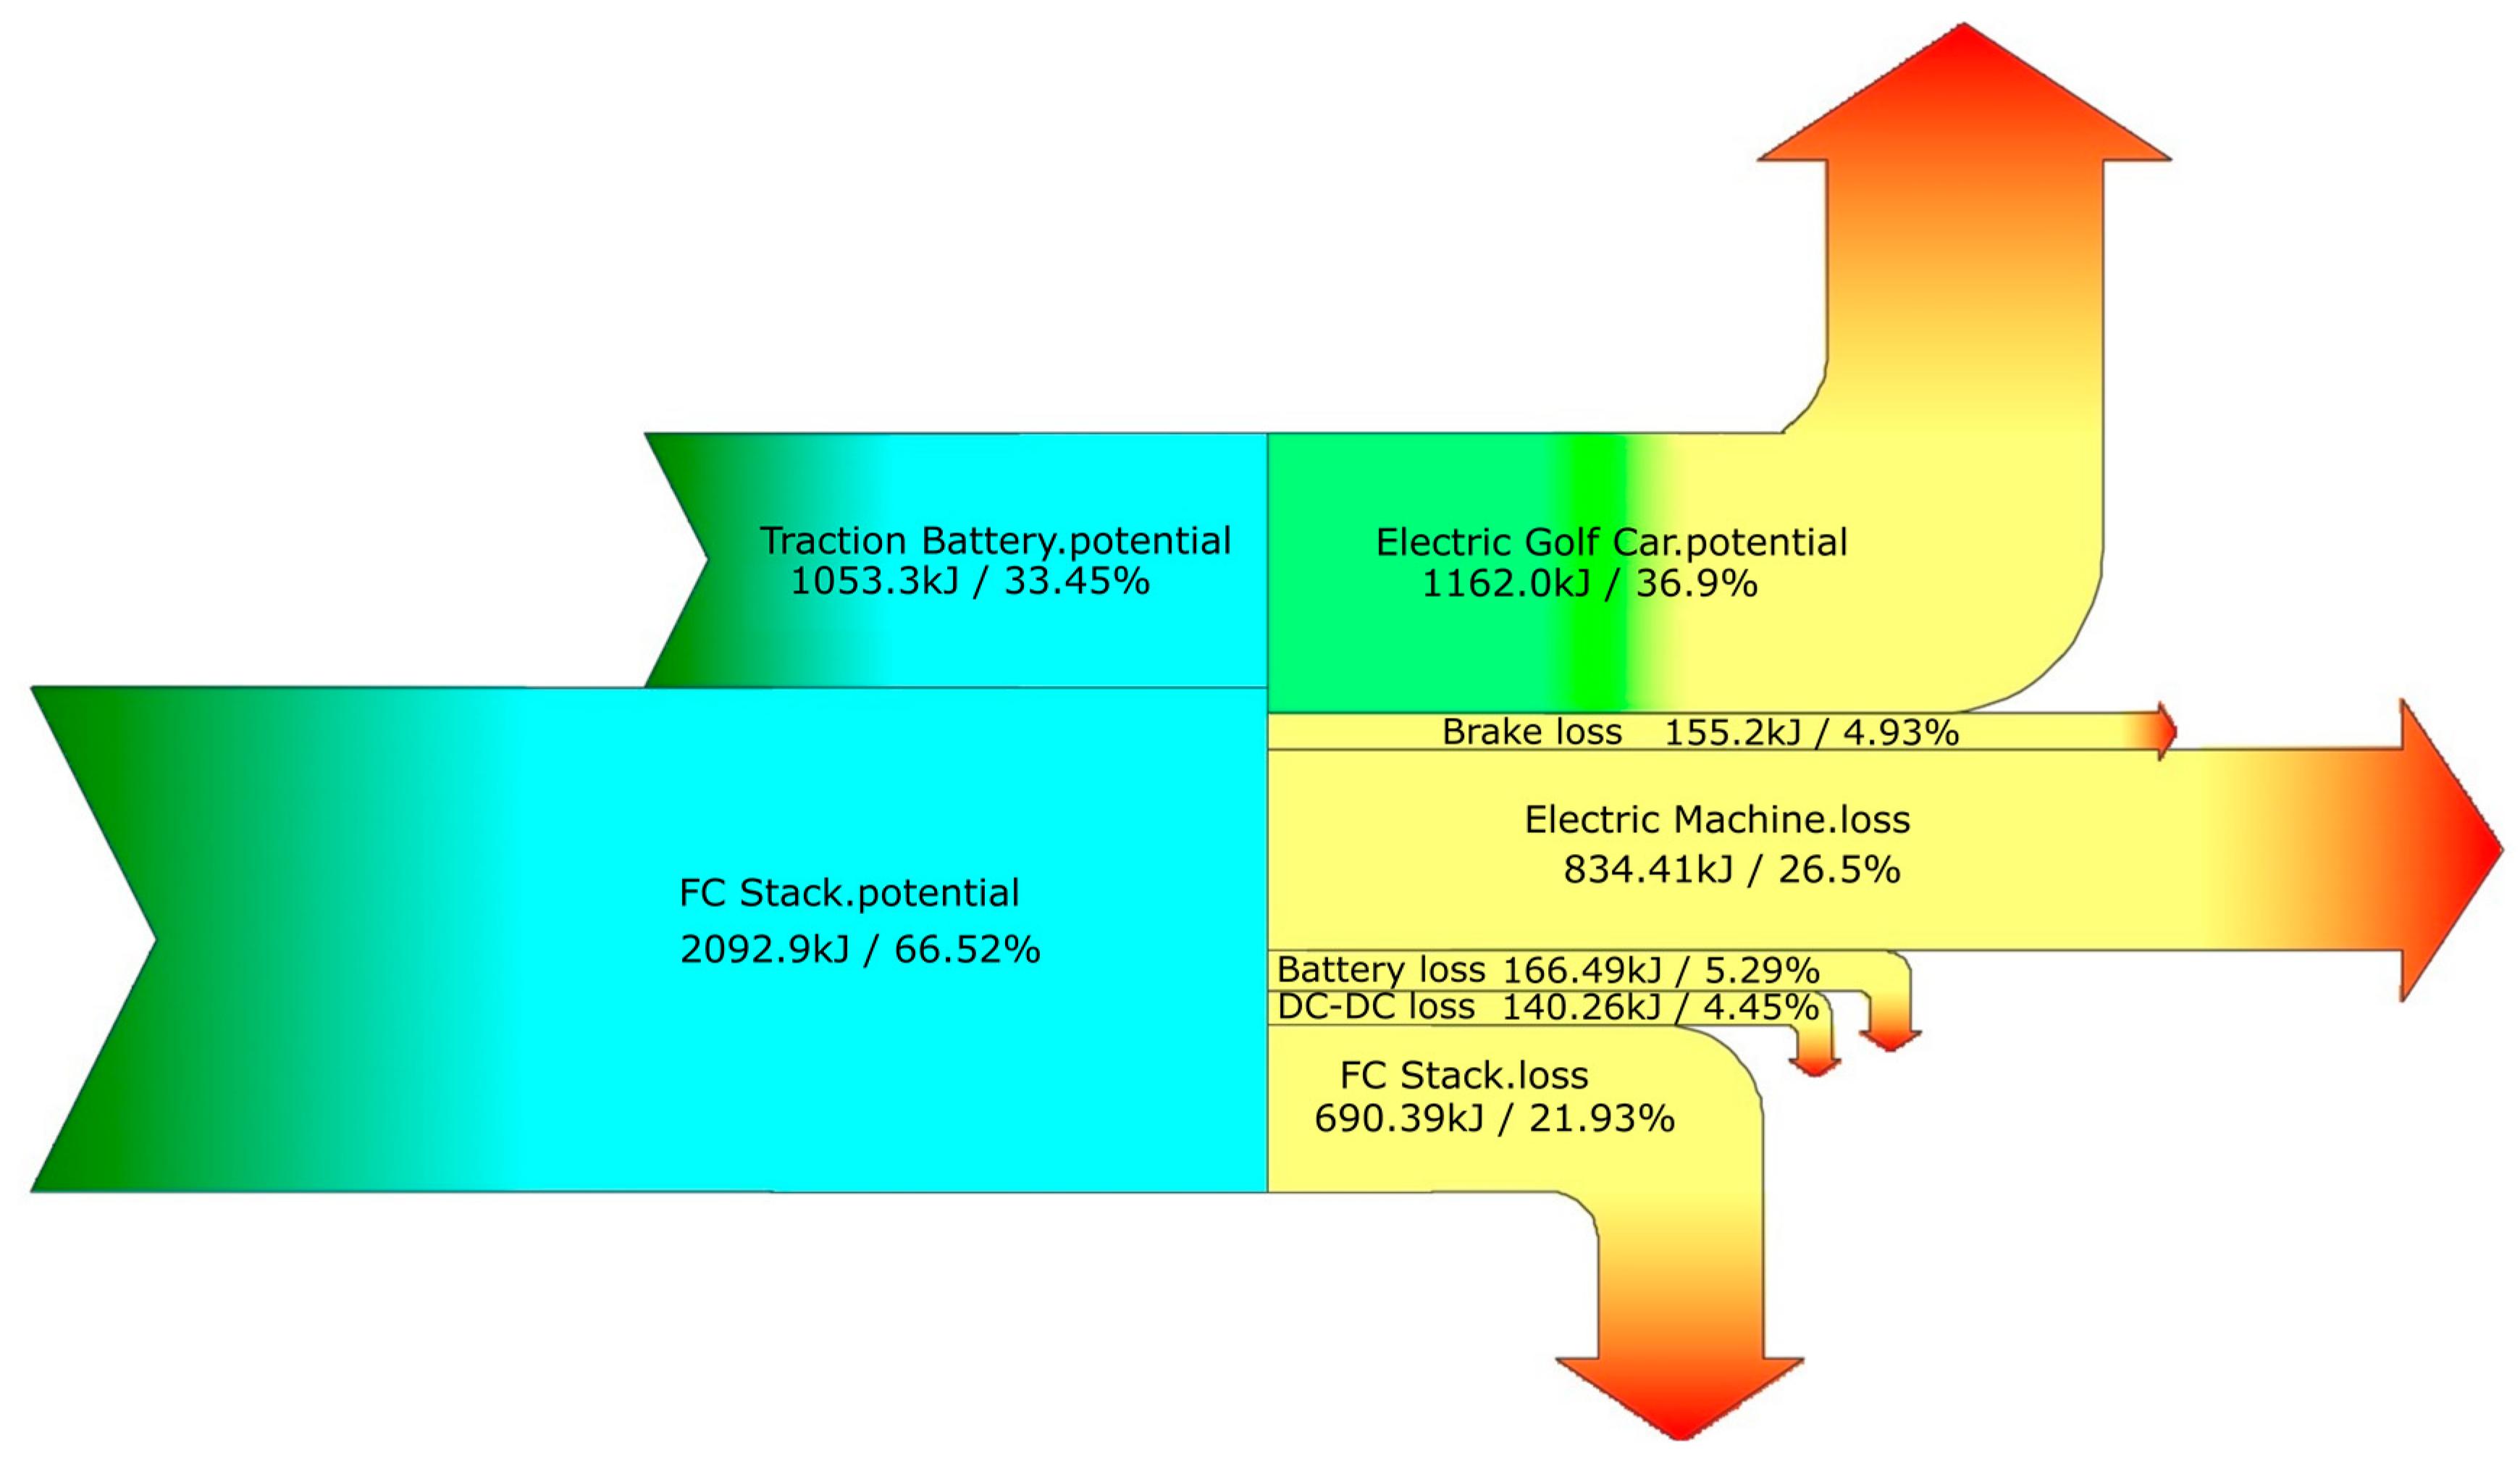 Car Precedent Wiring Diagram Adding To Club Car Electric Resource